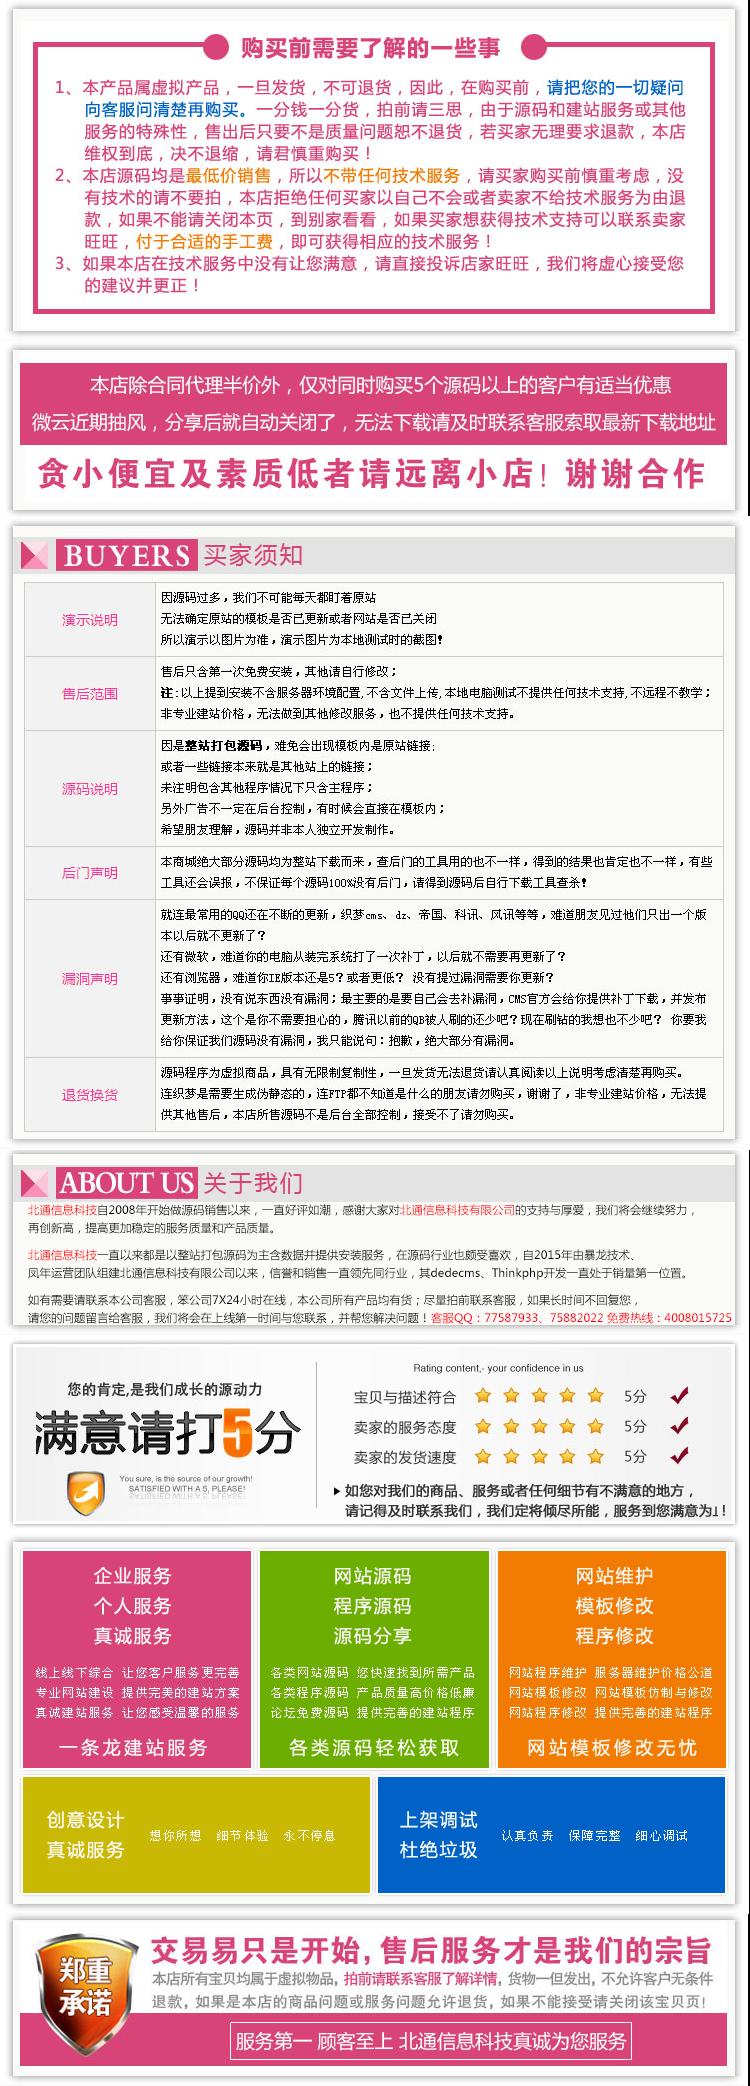 QQ域名防红源码 优启梦防洪 带接口程序短网址生成源码 网站防红源码 QQ防红 微信防红